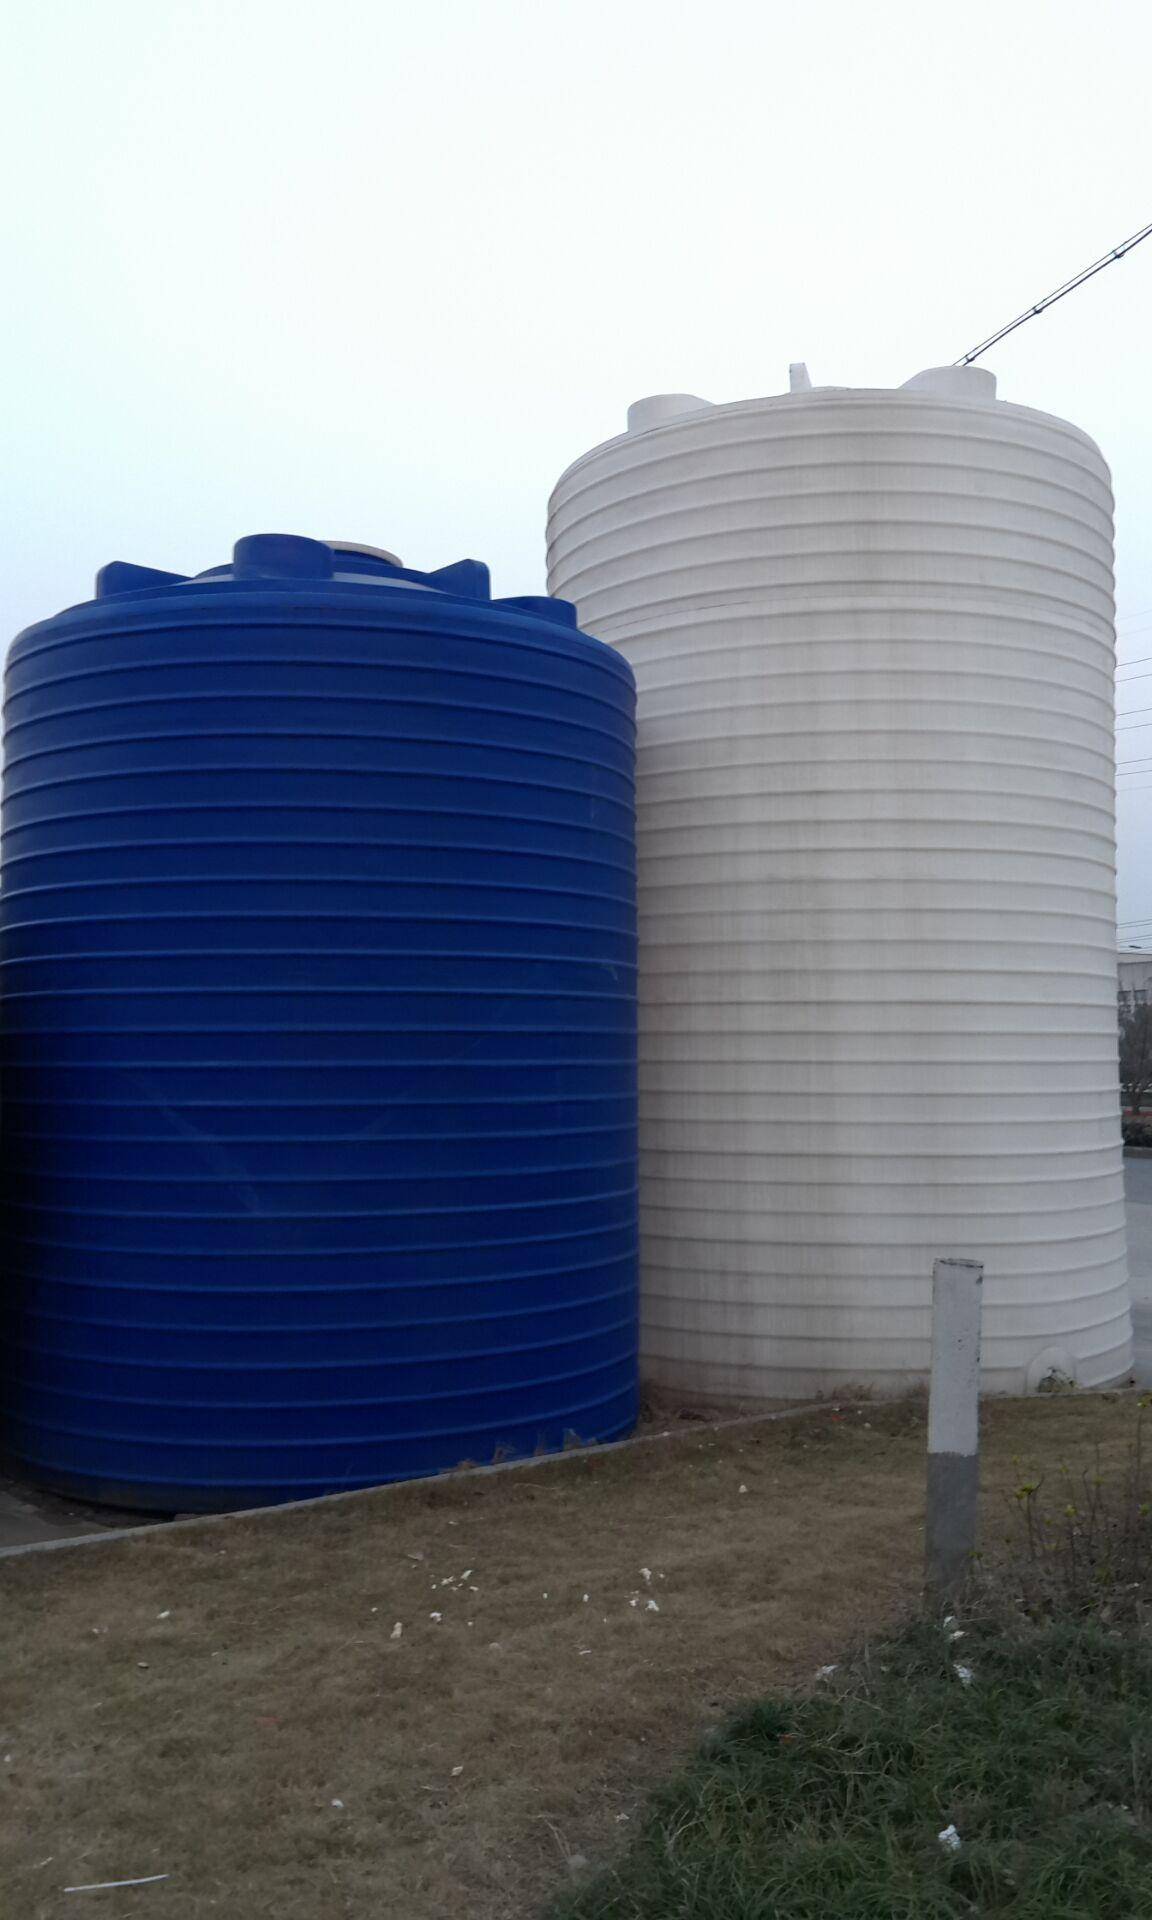 20 - tonnen - anti - aging - Spar - wassertank korrosionsschutz Alkali - PE - Fass konkrete zusatzstoffe Tank